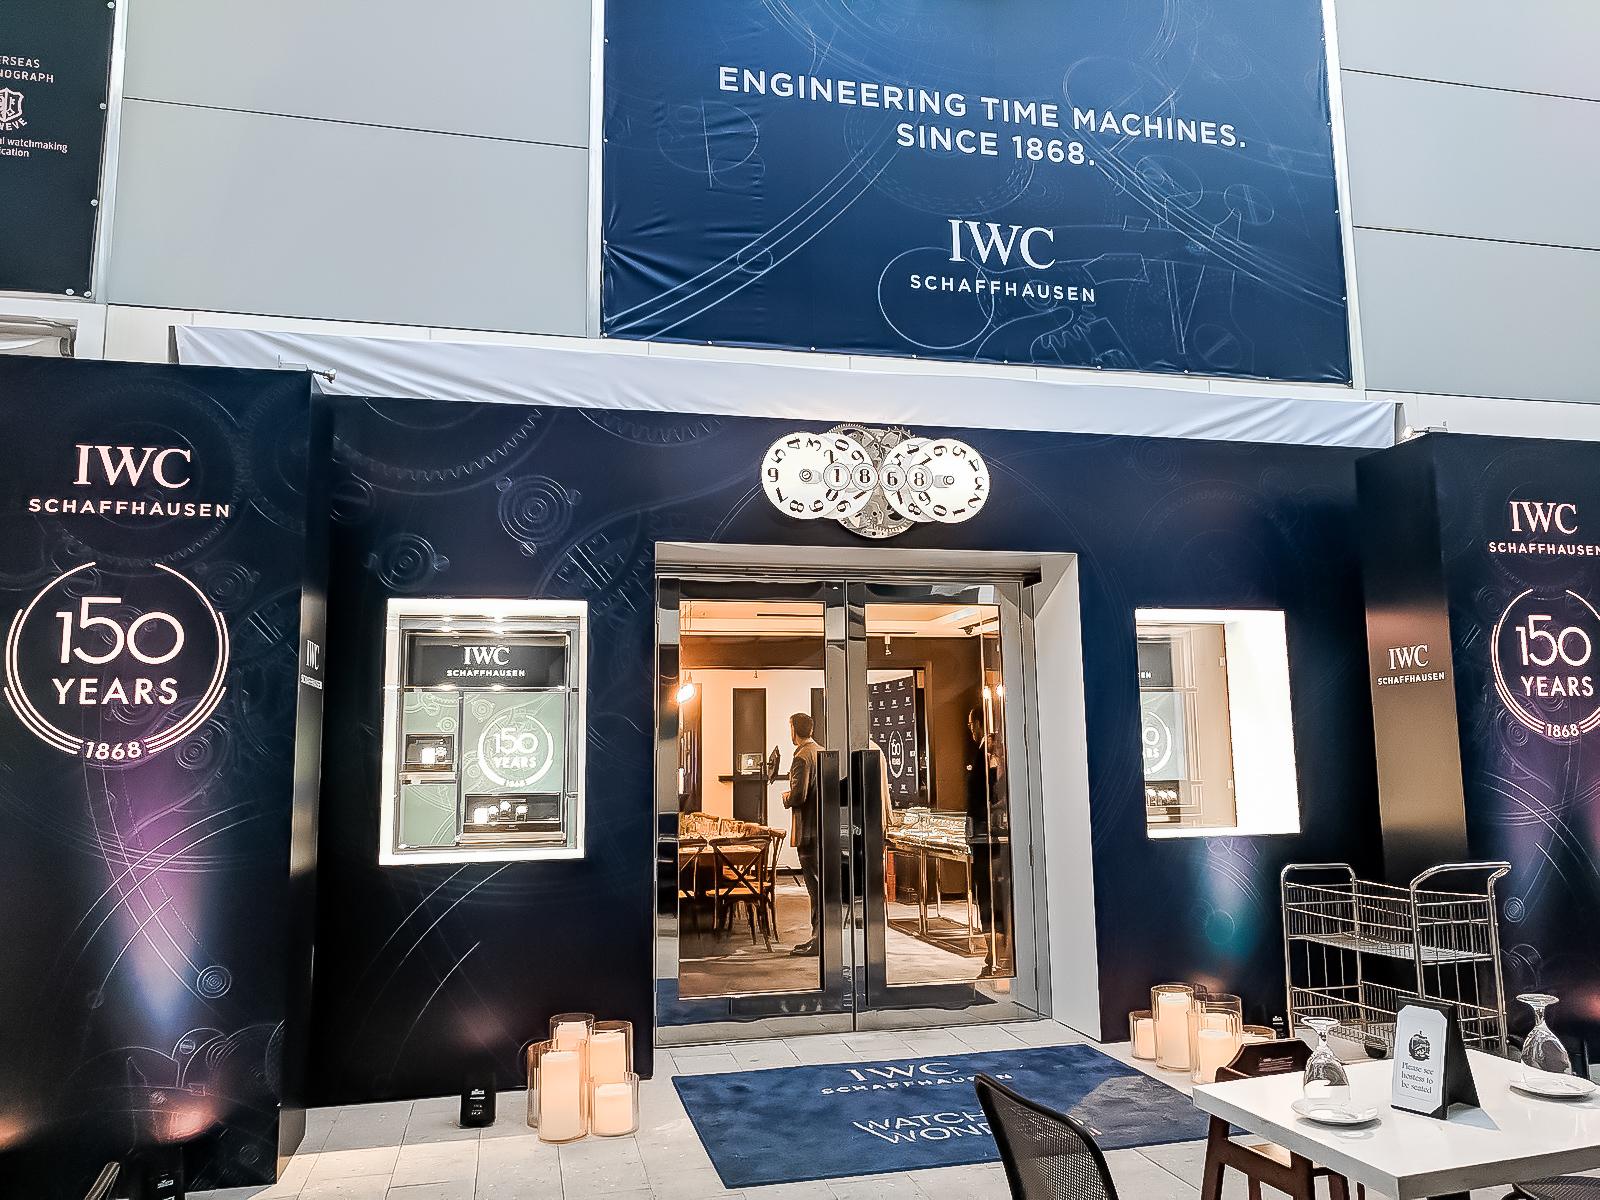 IWC    Design  / Event Installation / Print Production